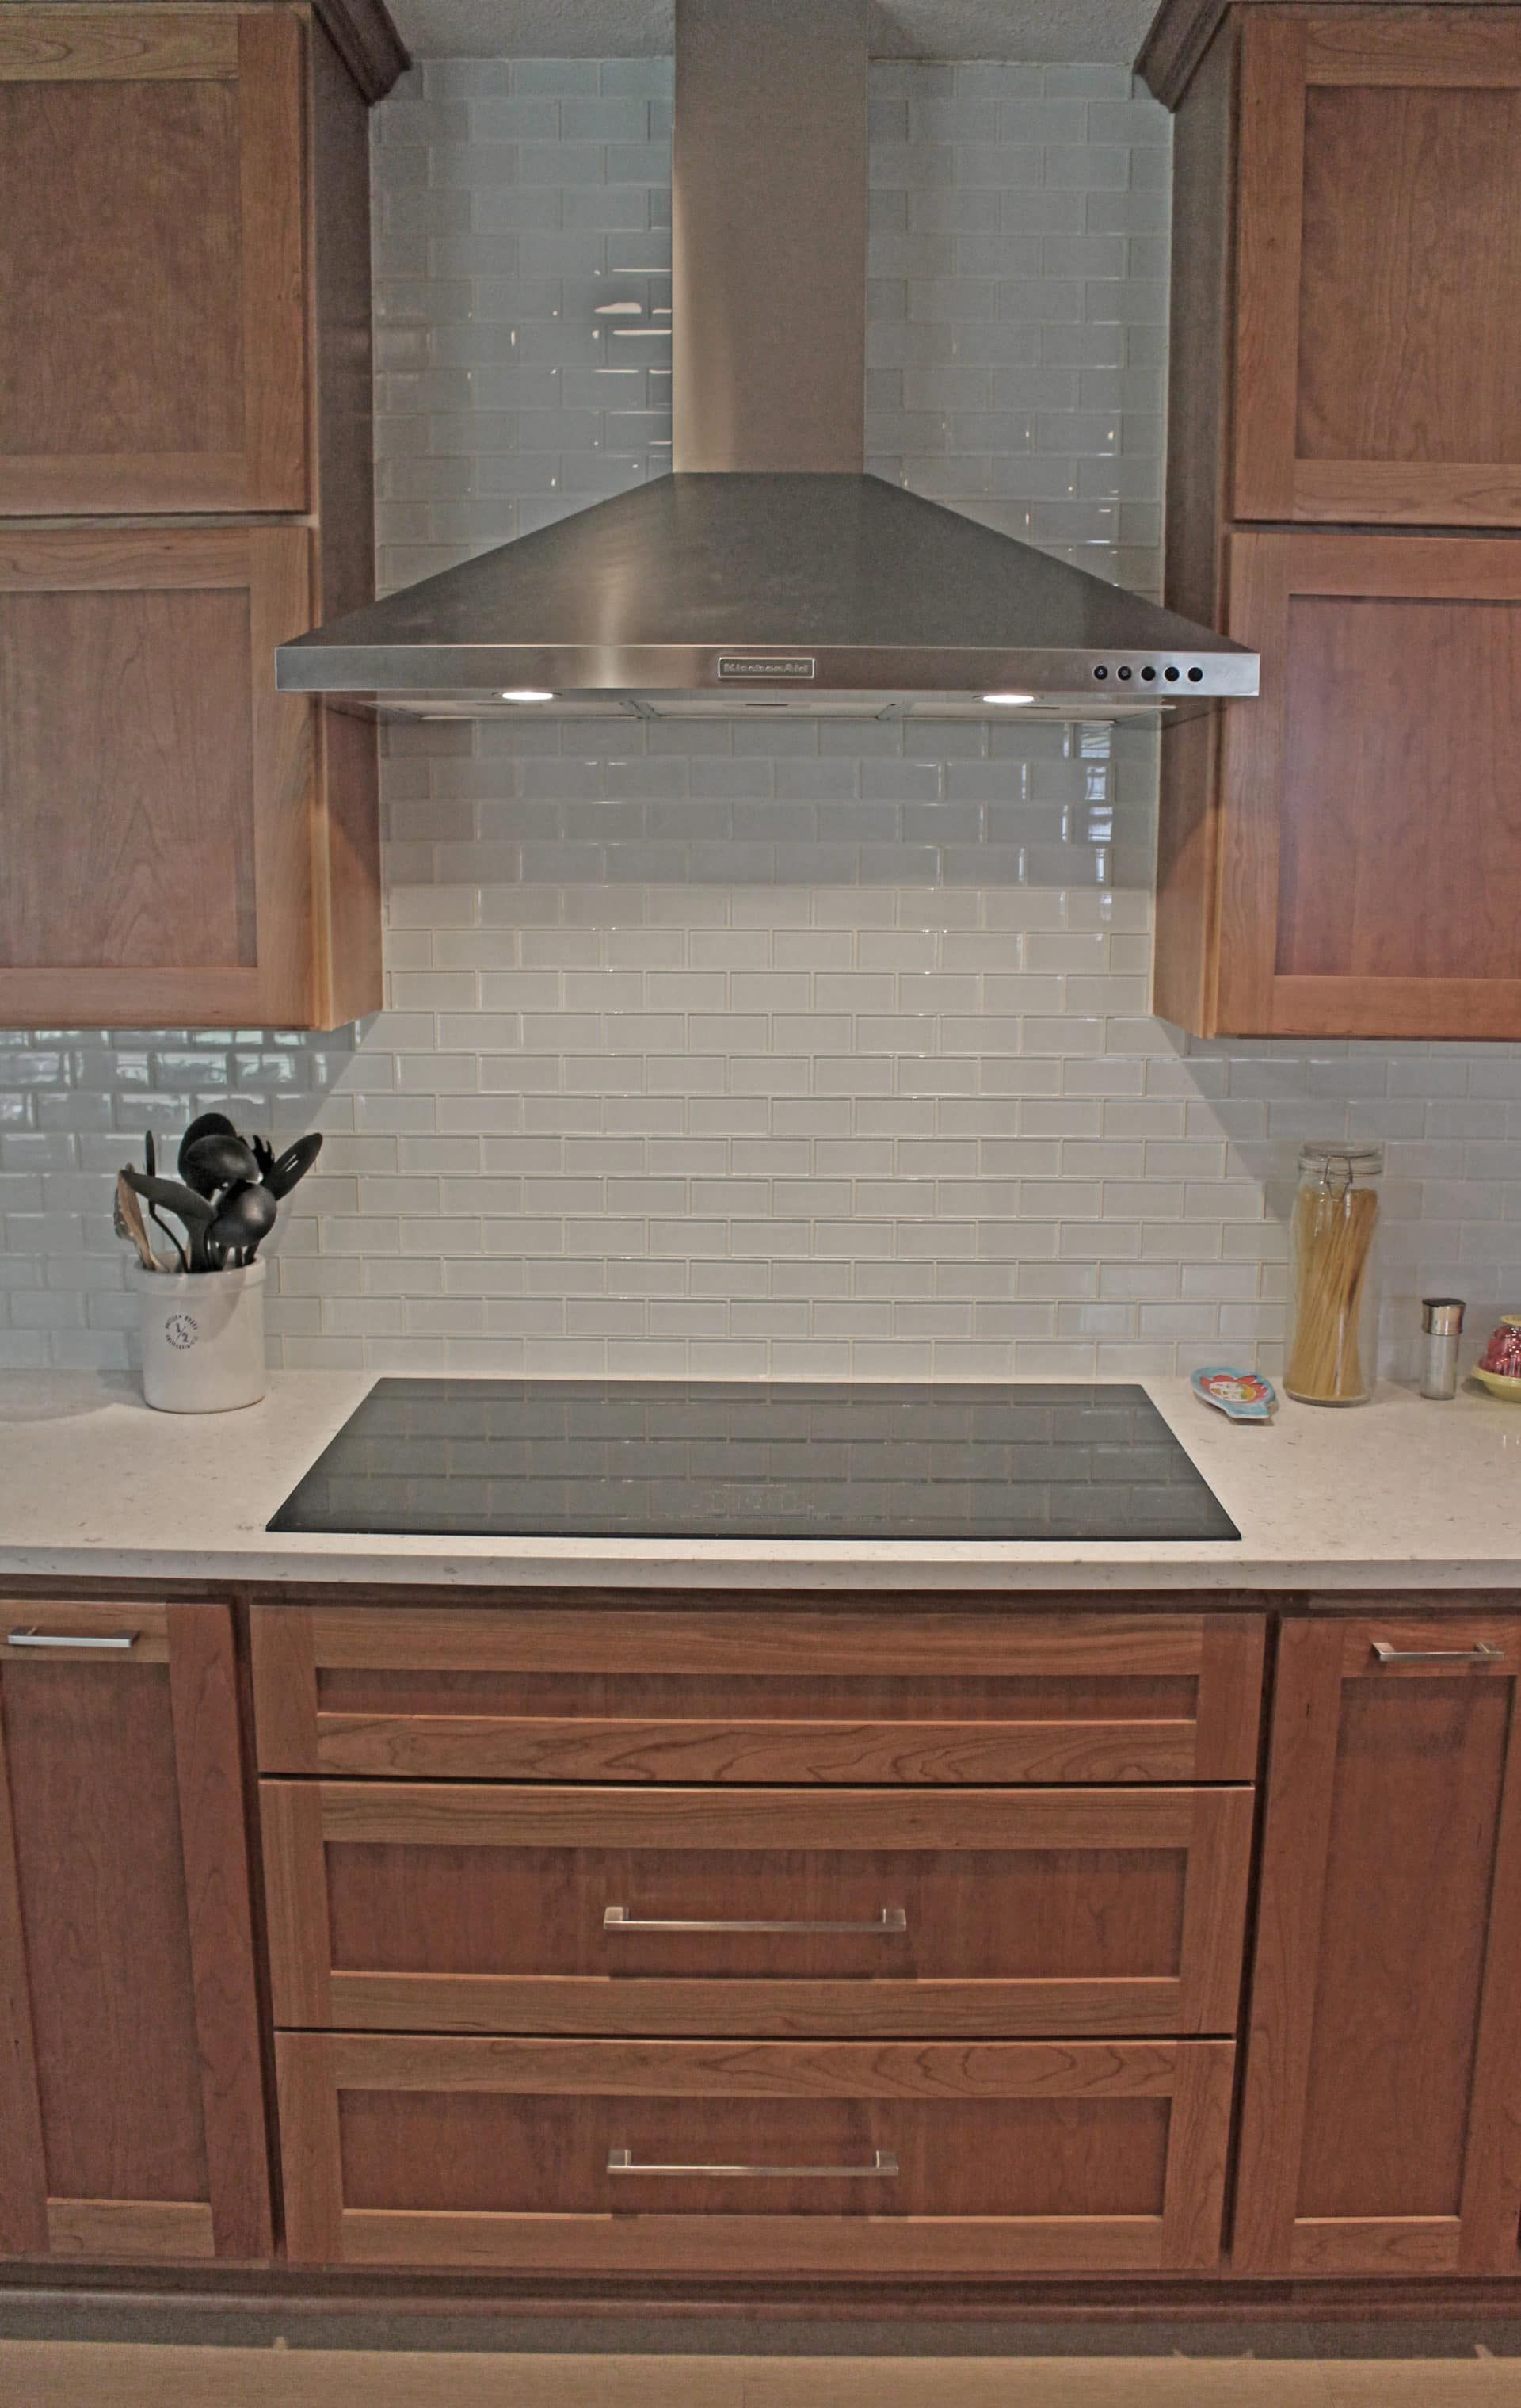 Kitchen Cabinets Austin Tx 2020 In 2020 Design Your Kitchen Kitchen Cabinets Kitchen